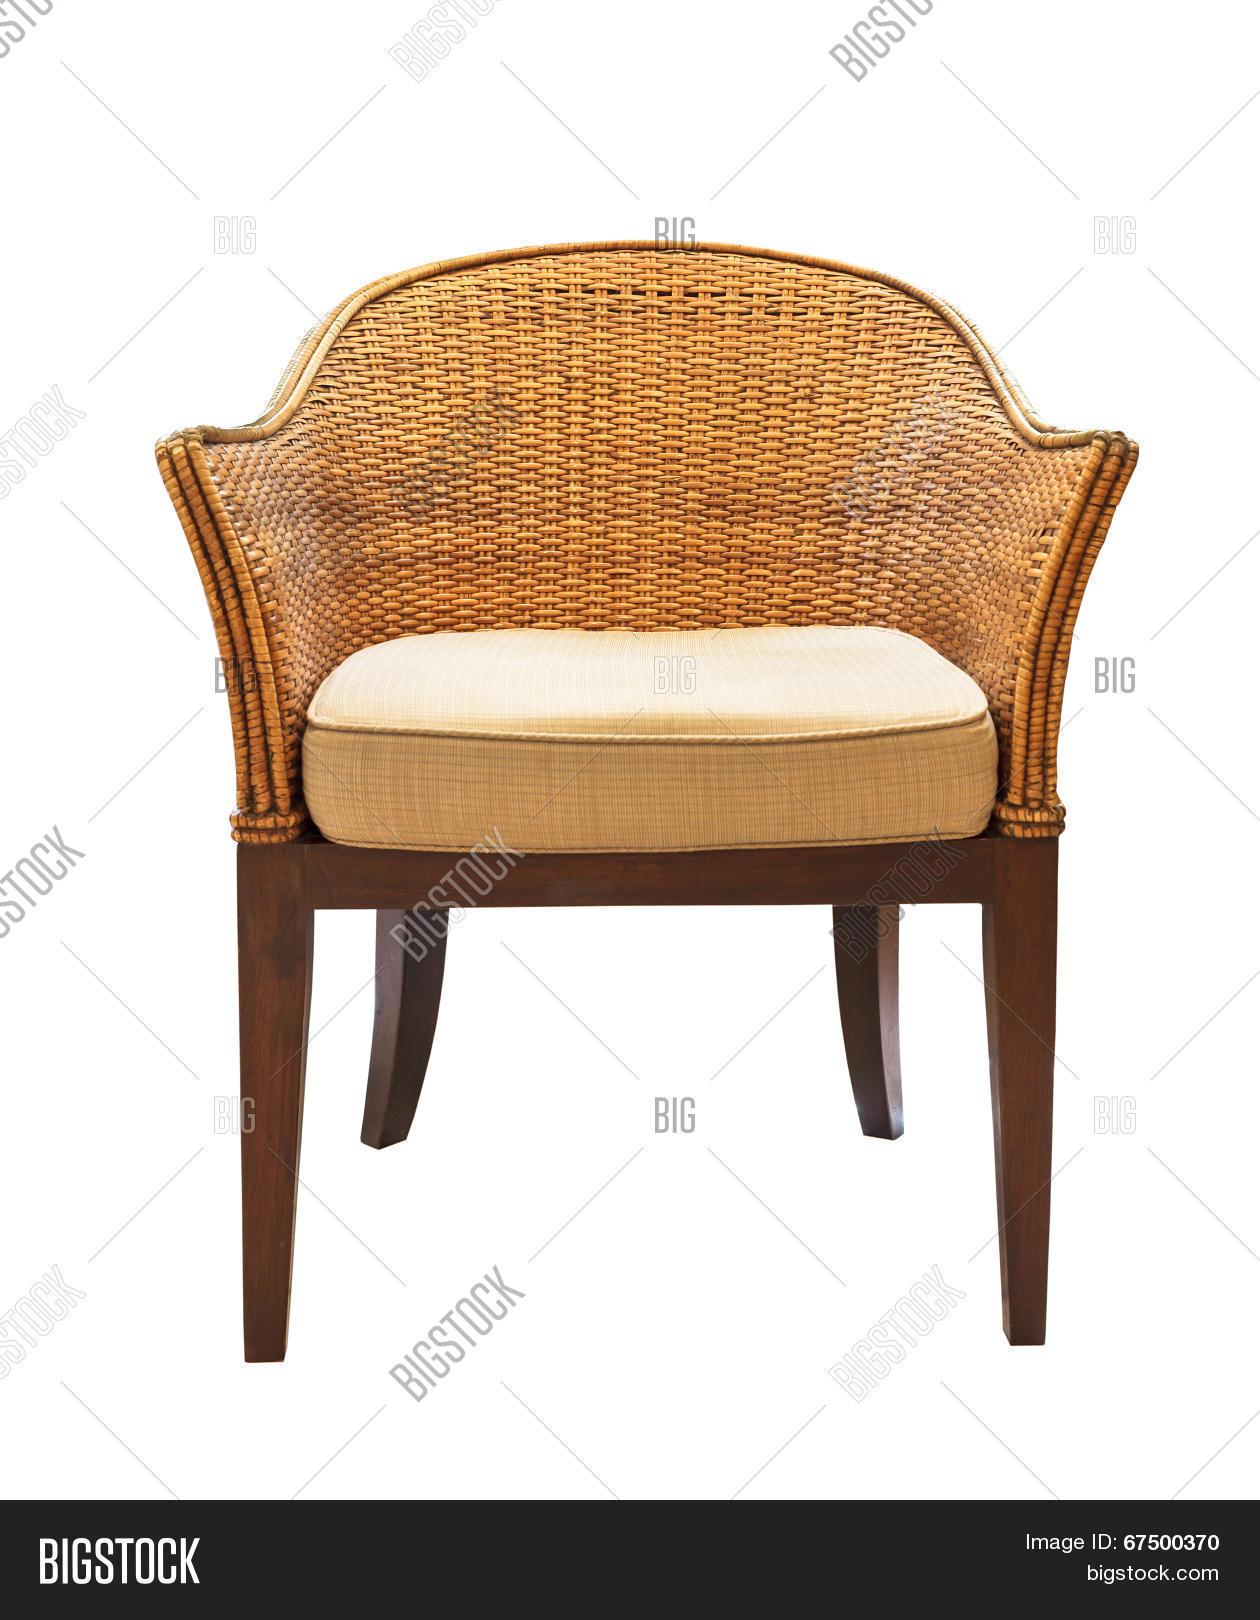 Magnificent Sofa Furniture Weave Image Photo Free Trial Bigstock Download Free Architecture Designs Scobabritishbridgeorg